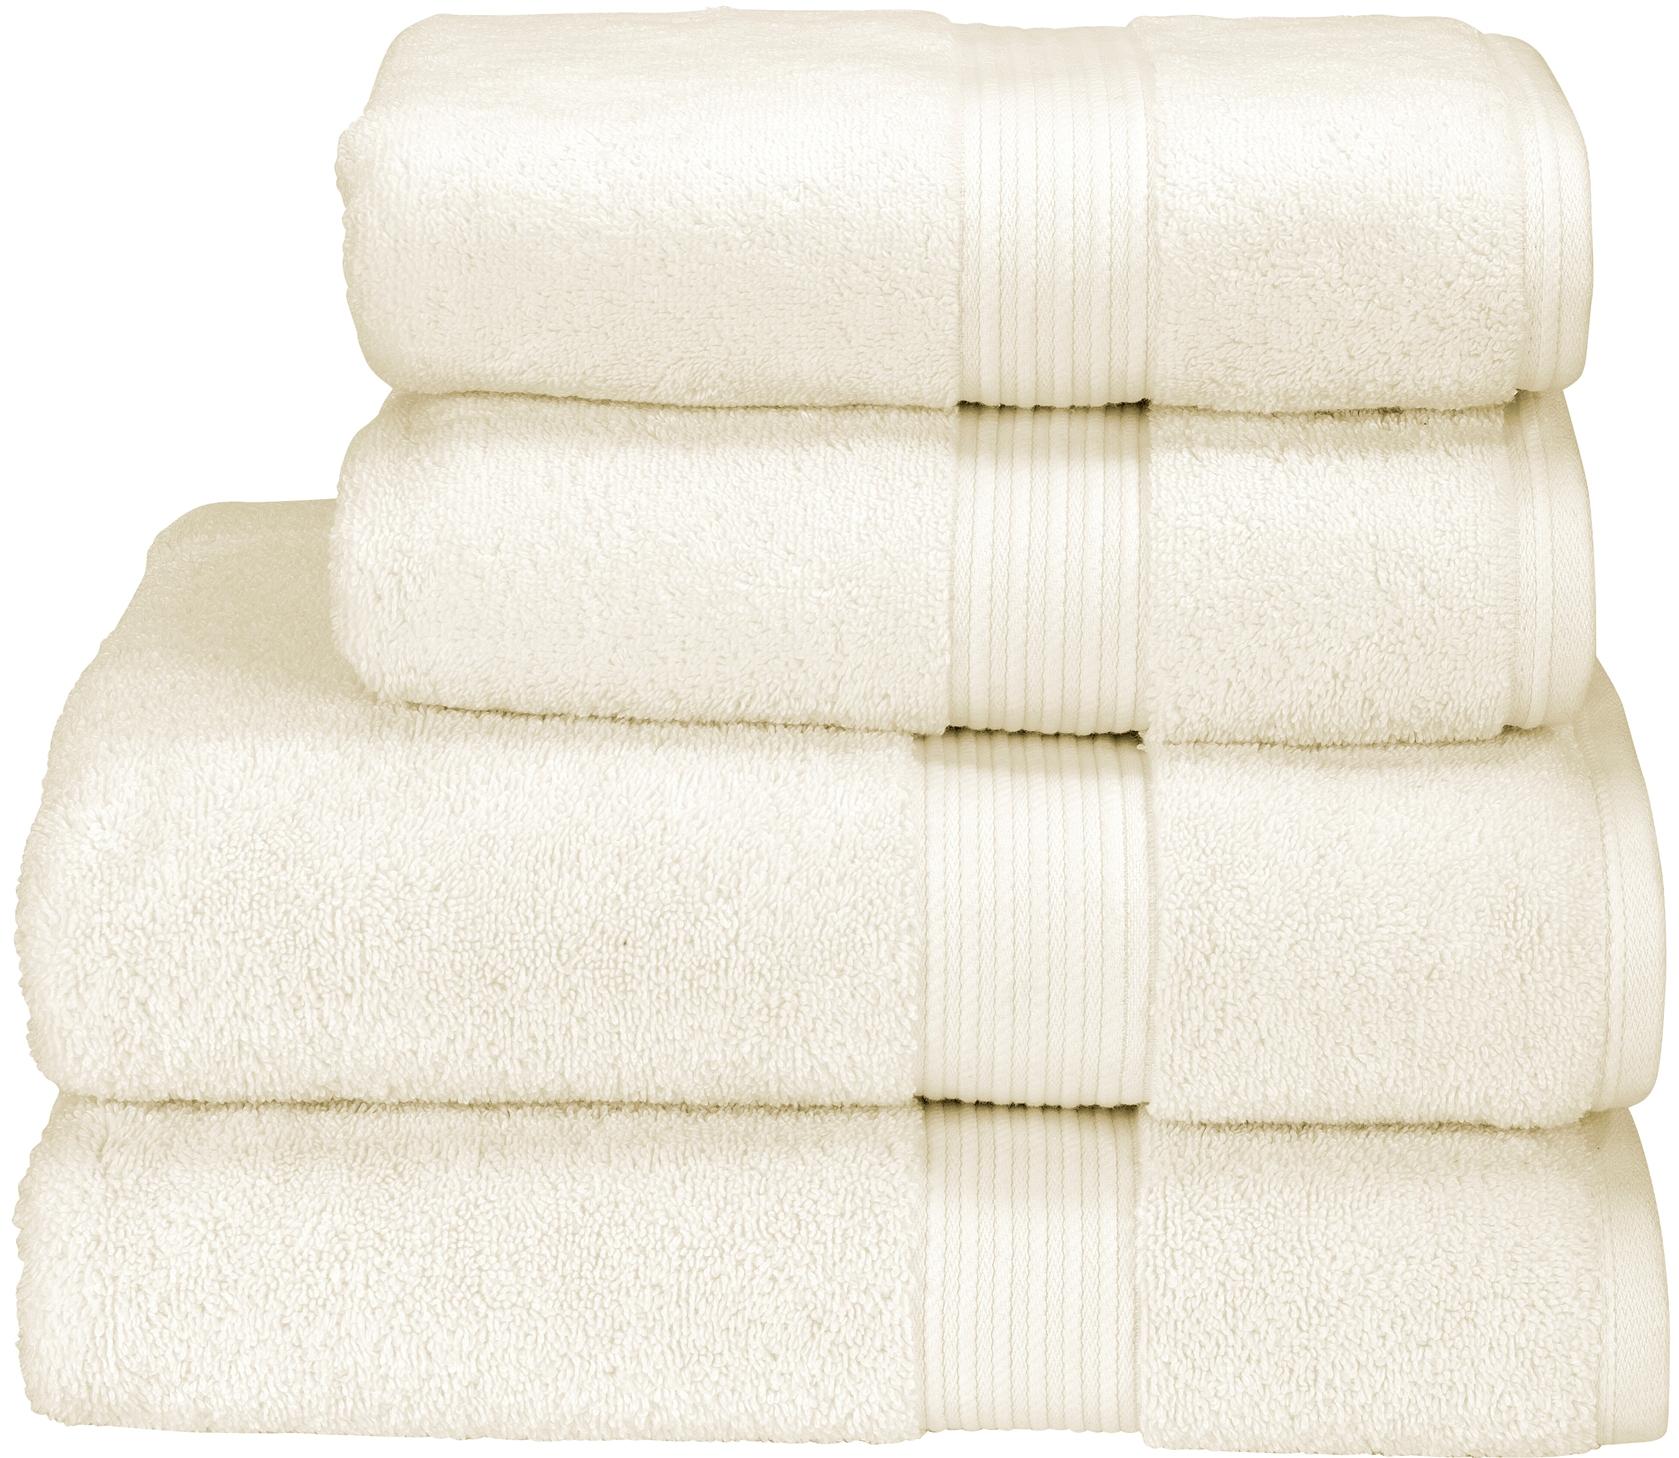 christy towels bathroom 100 supima cotton supreme hygro